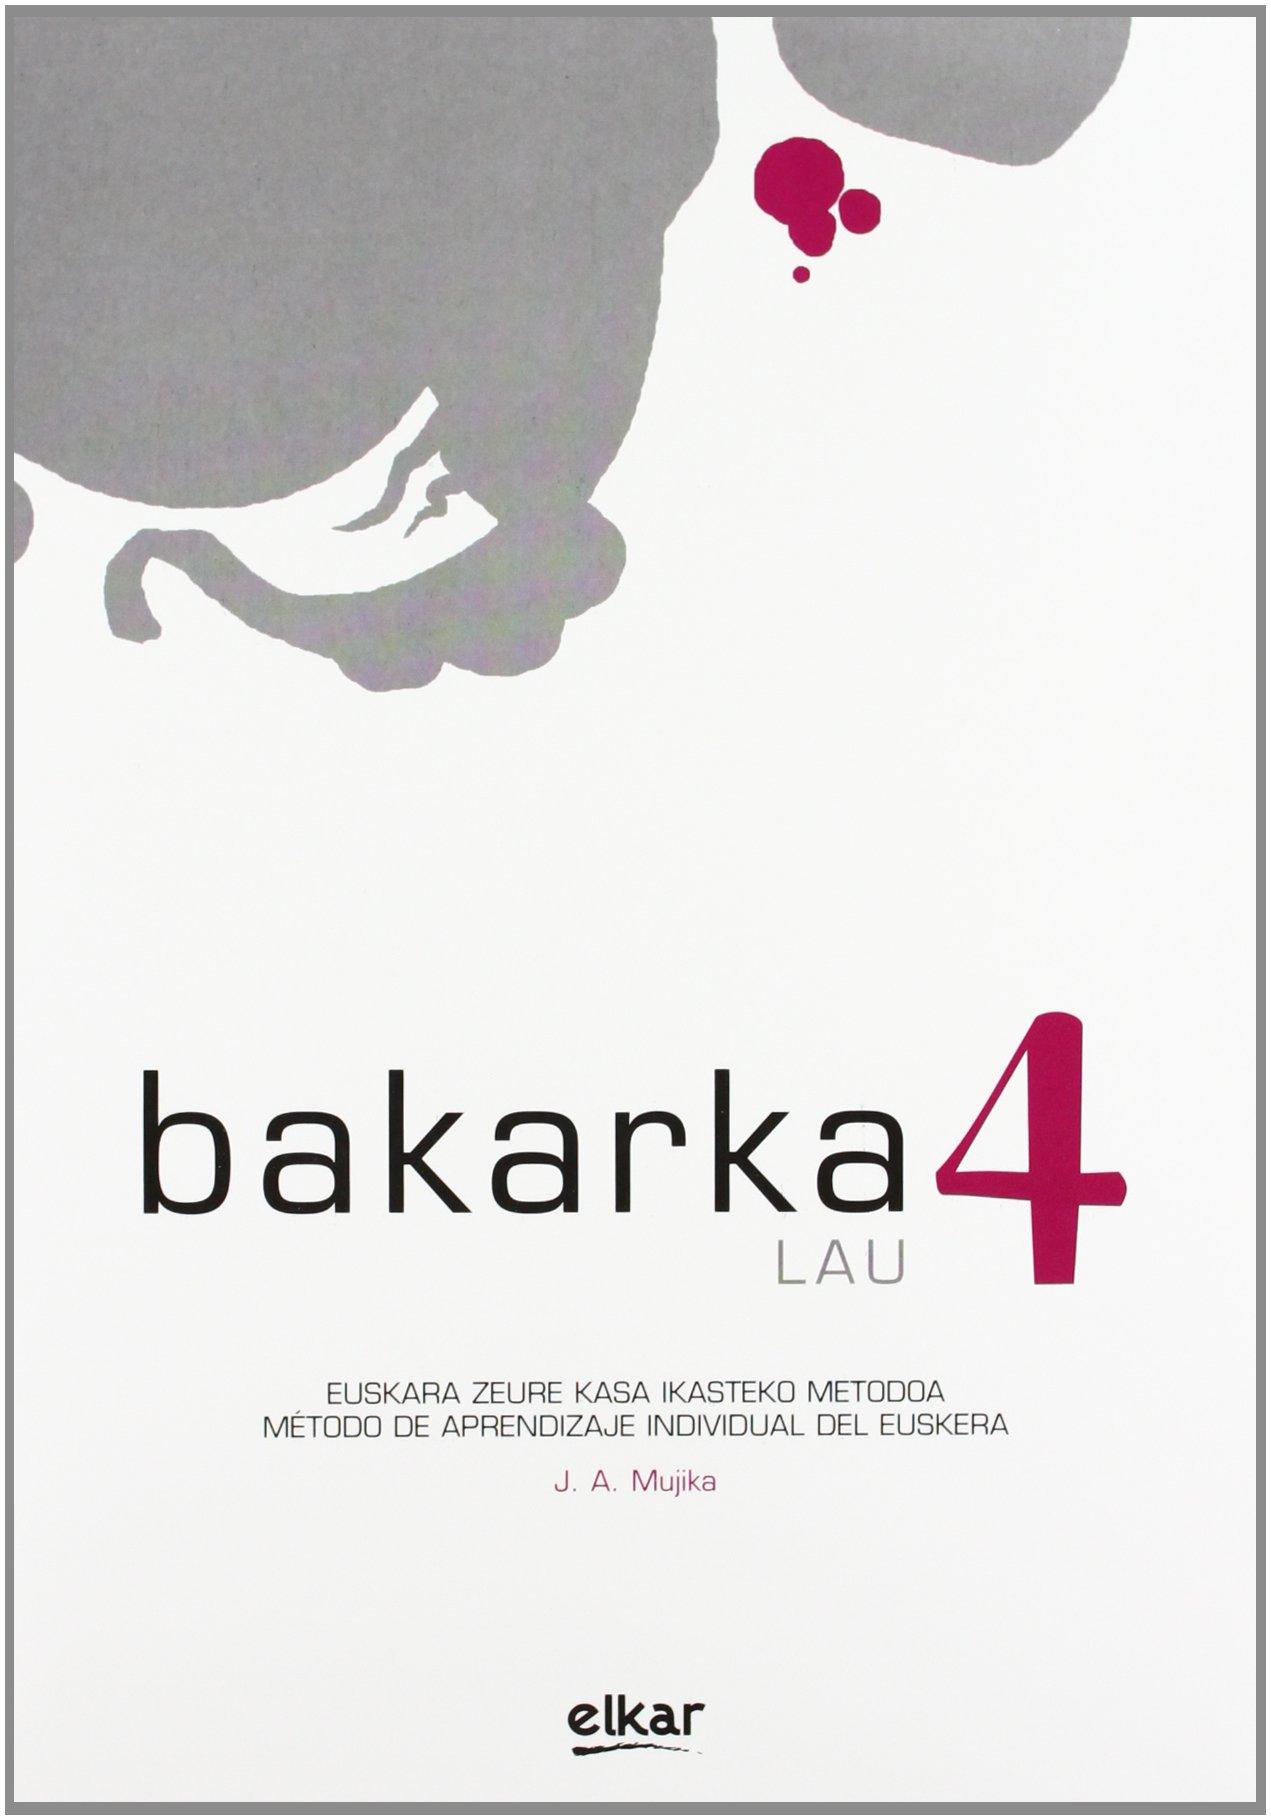 Bakarka 4 (Hizkuntza metodoak) (Euskera) Tapa blanda – 1 jun 2011 Jose Antonio Mujika Kasares Elkarlanean S.L. 849783979X